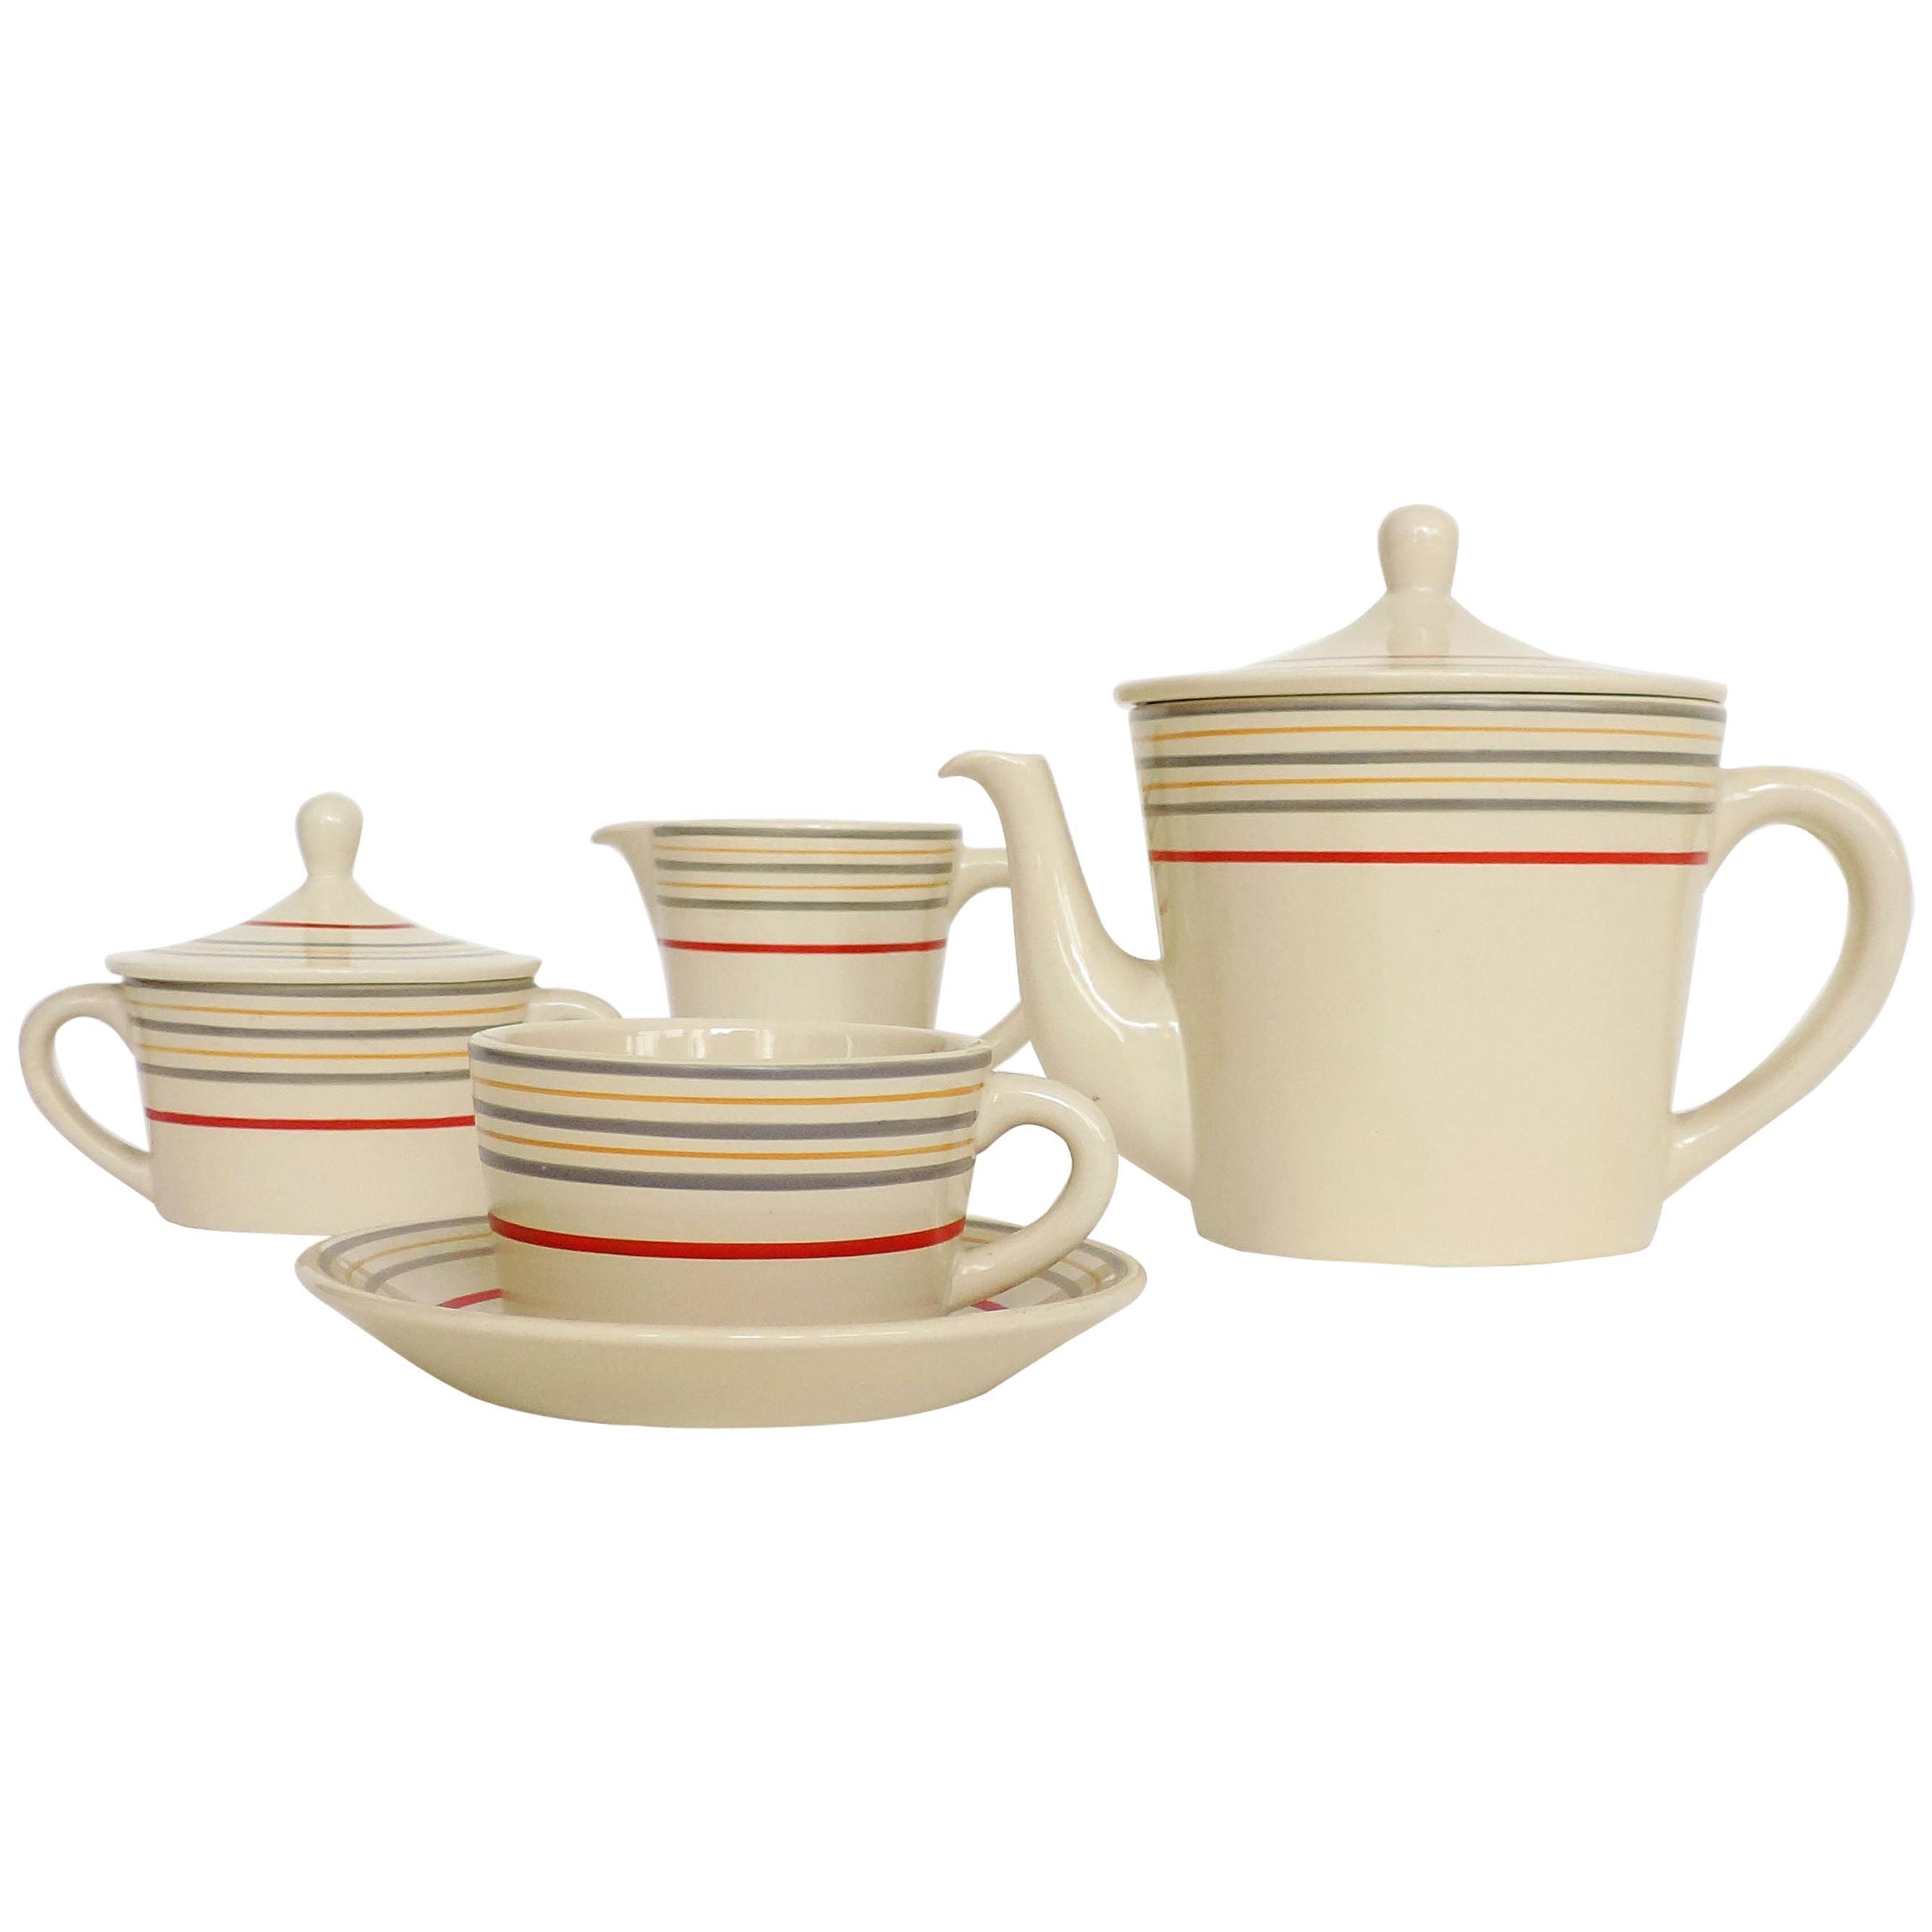 Gio Ponti 20th Century Ceramic Coffee set for Richard, Italy, 1920s